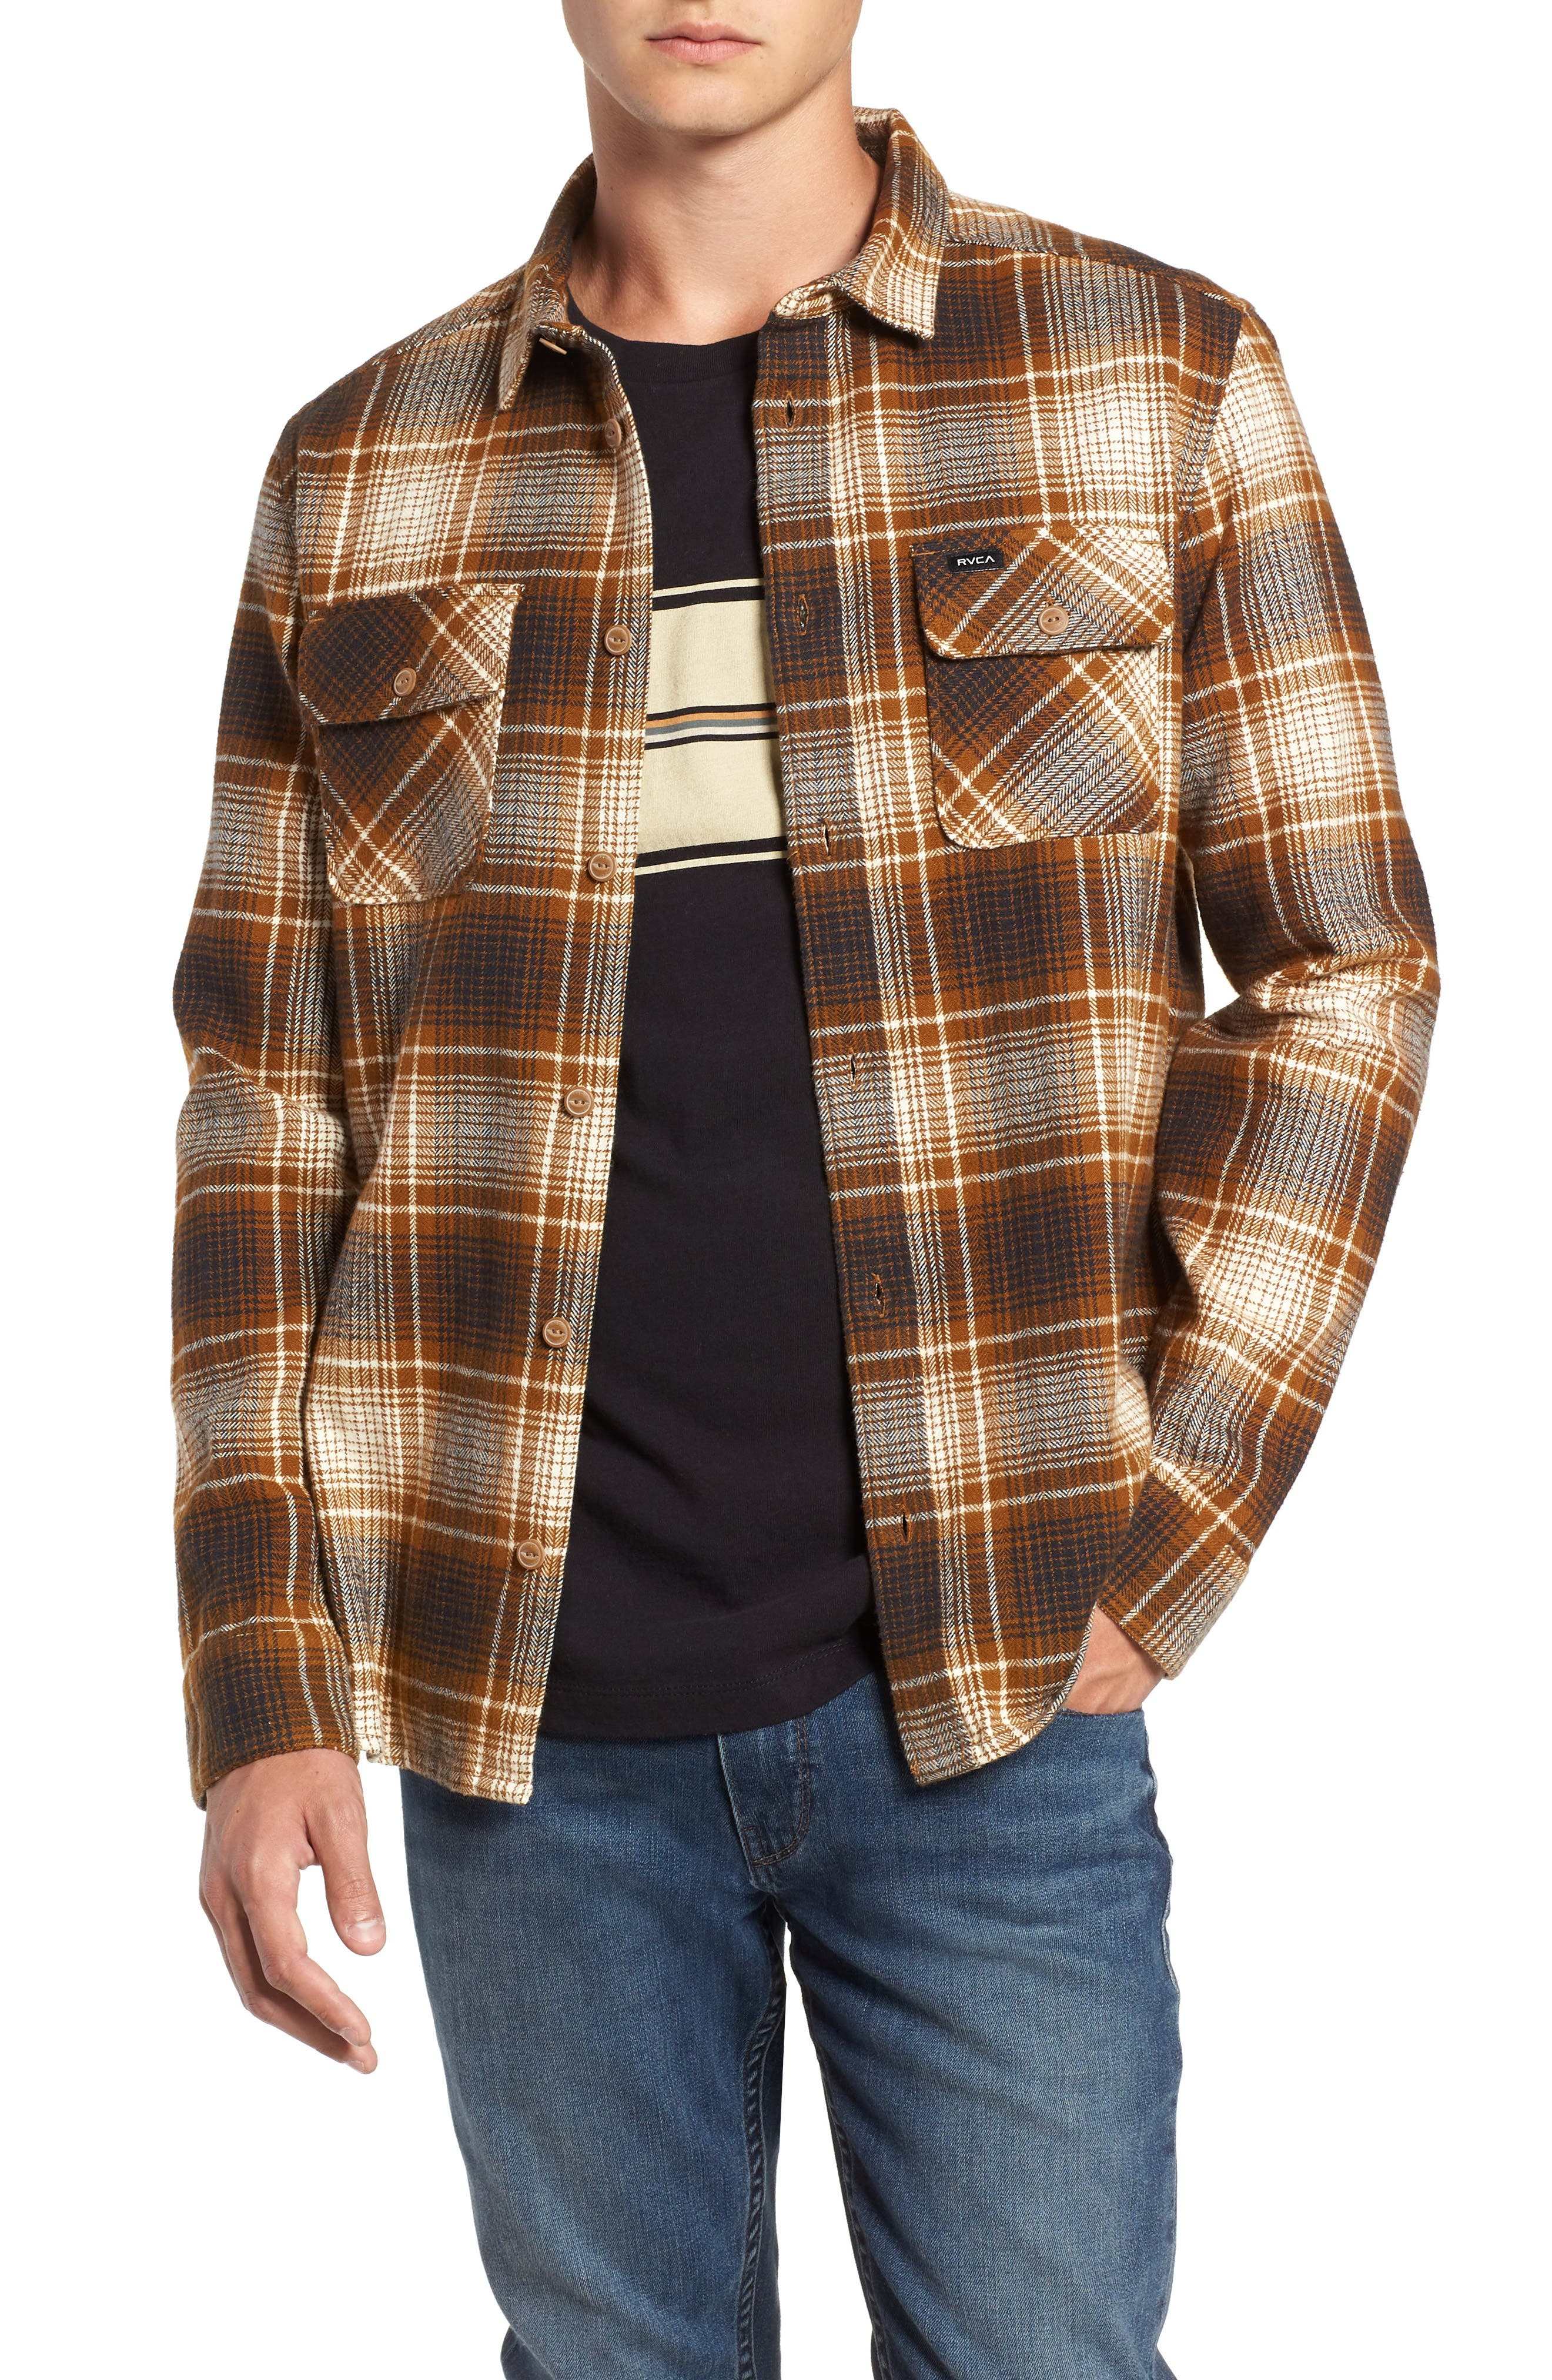 Rvca High Plains Flannel Shirt, Metallic